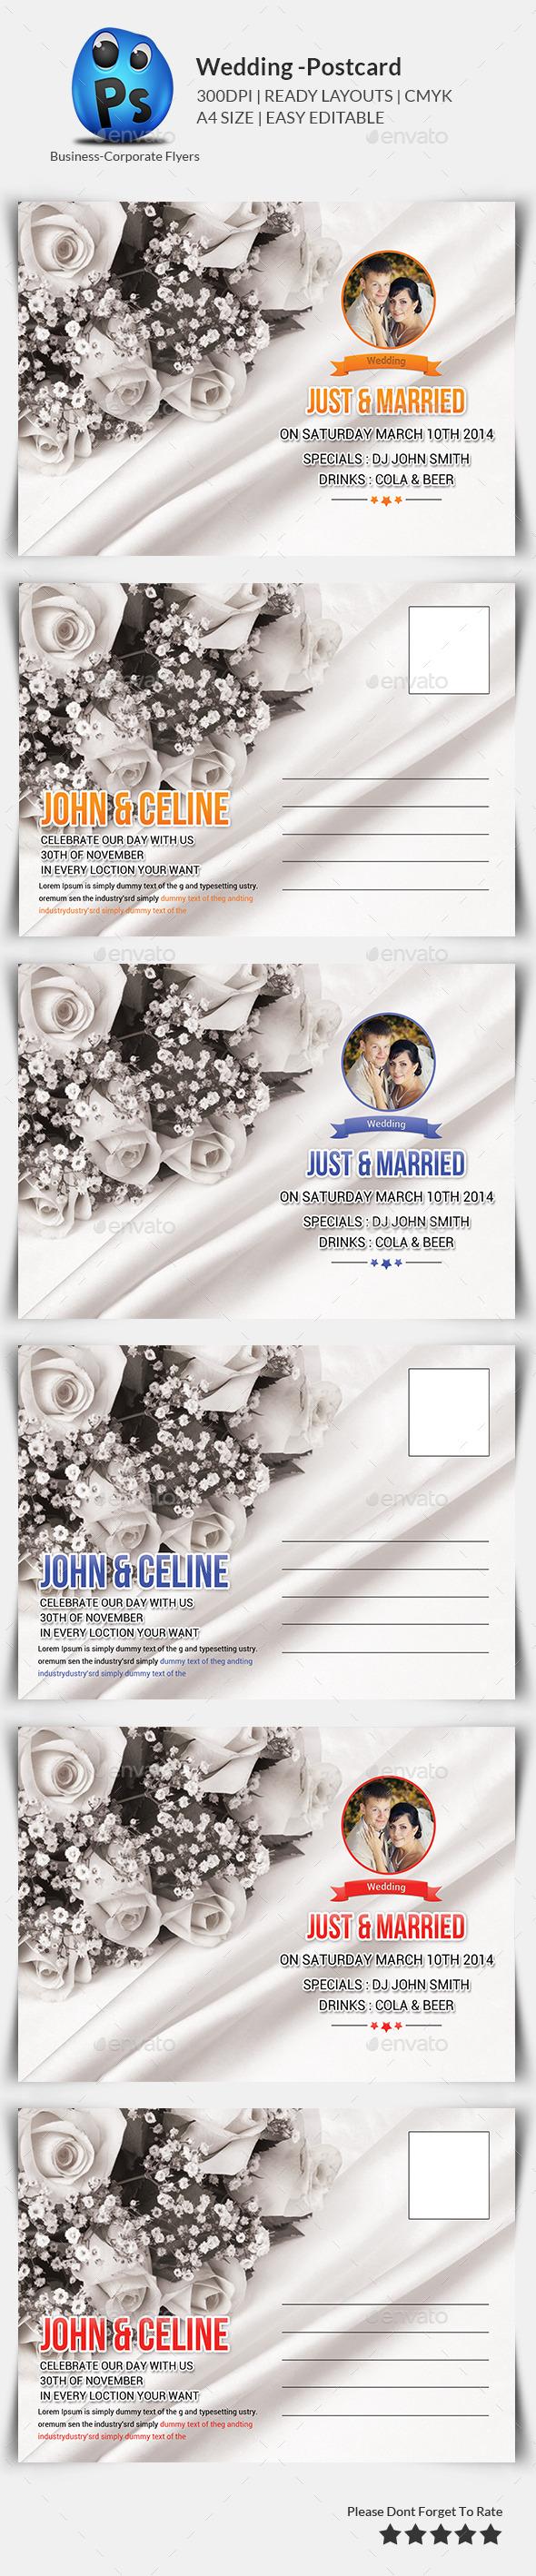 Wedding Postcard Print Templates - Cards & Invites Print Templates